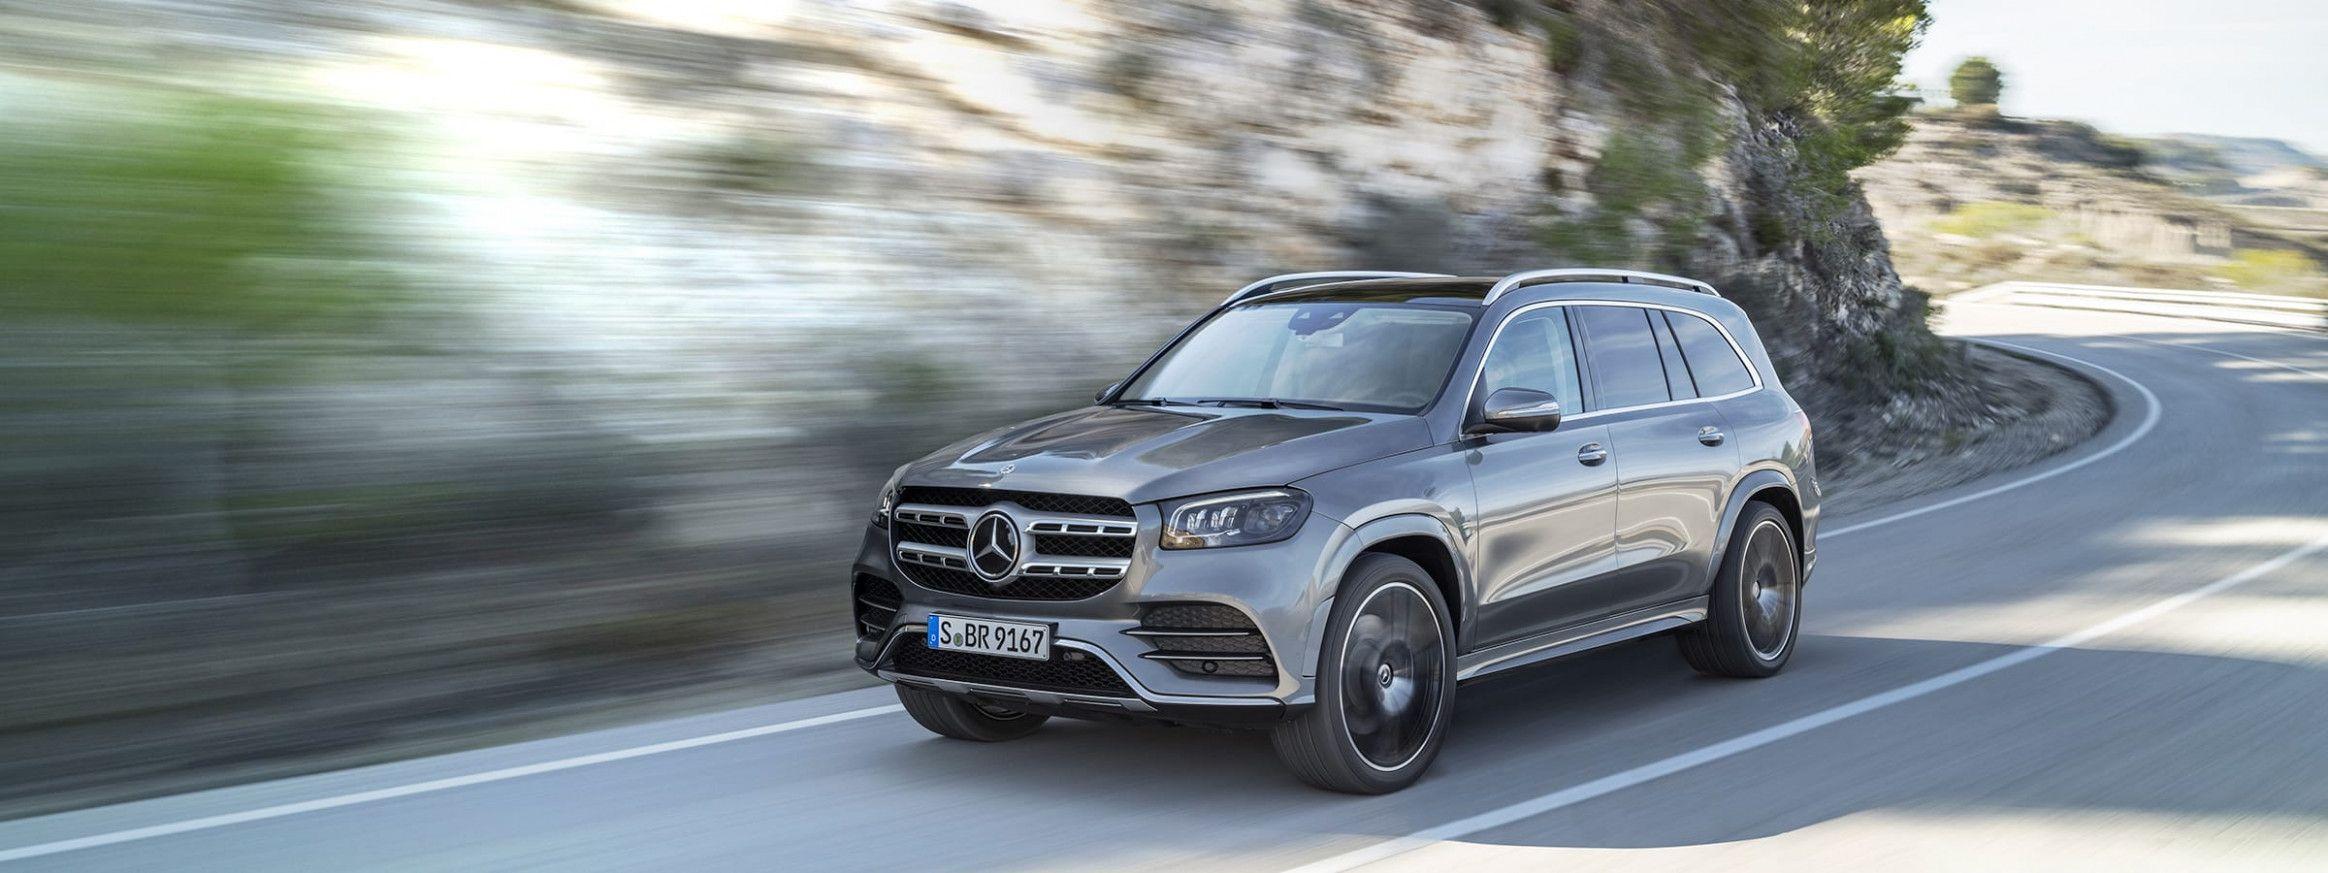 5 Gls Suv Future Vehicles Mercedes Benz Usa 2020 Mercedes